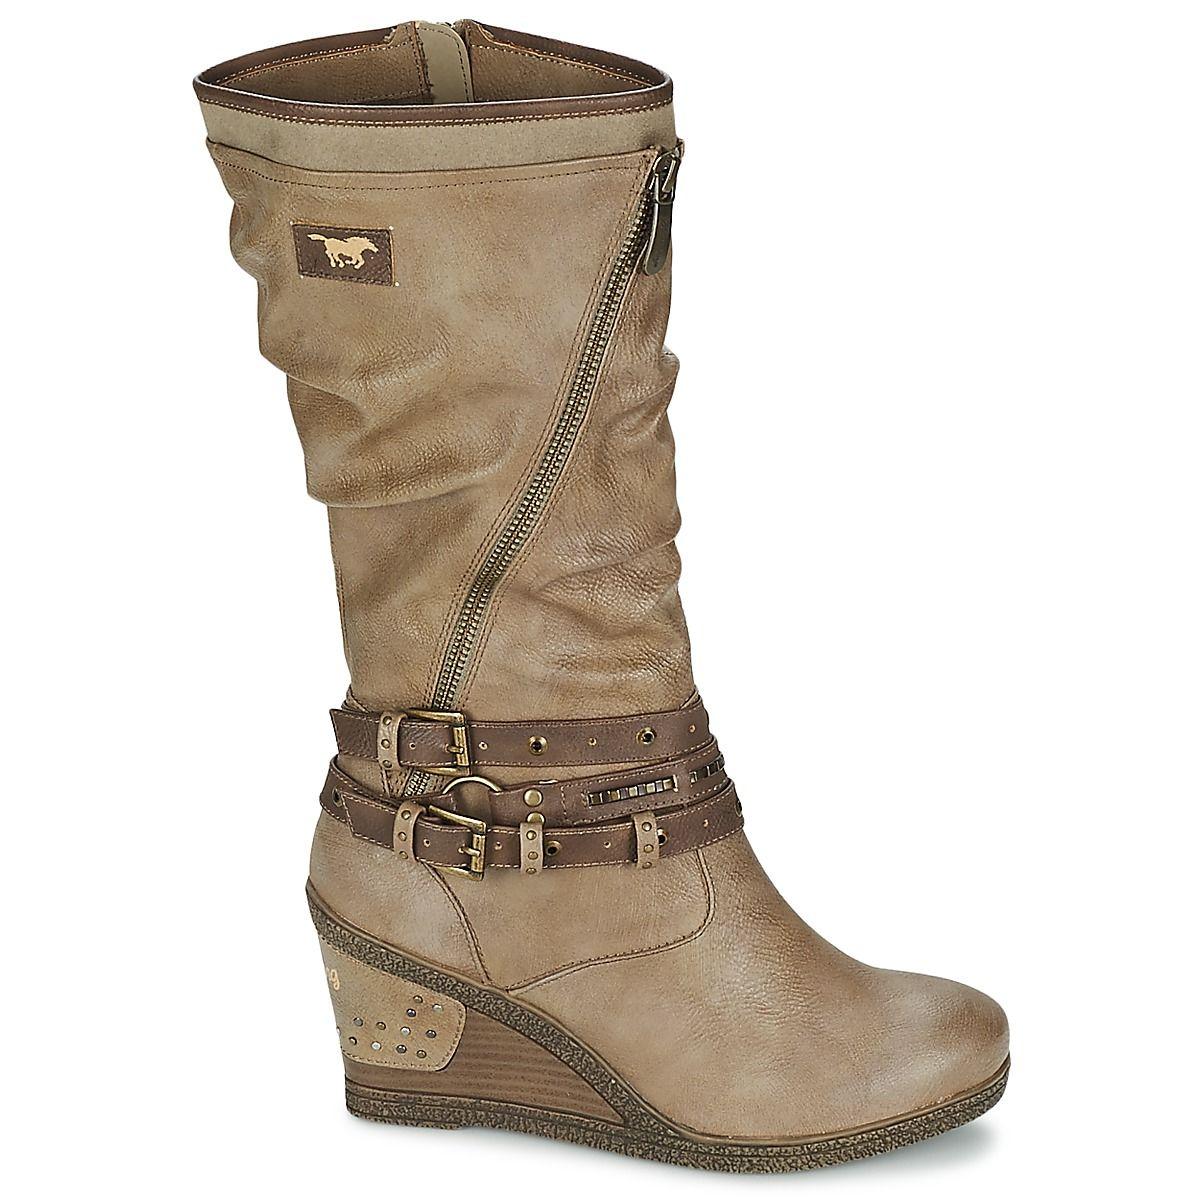 Kozaki Damskie Mustang Shoes 37c 026 Jesien Zima 2015 2016